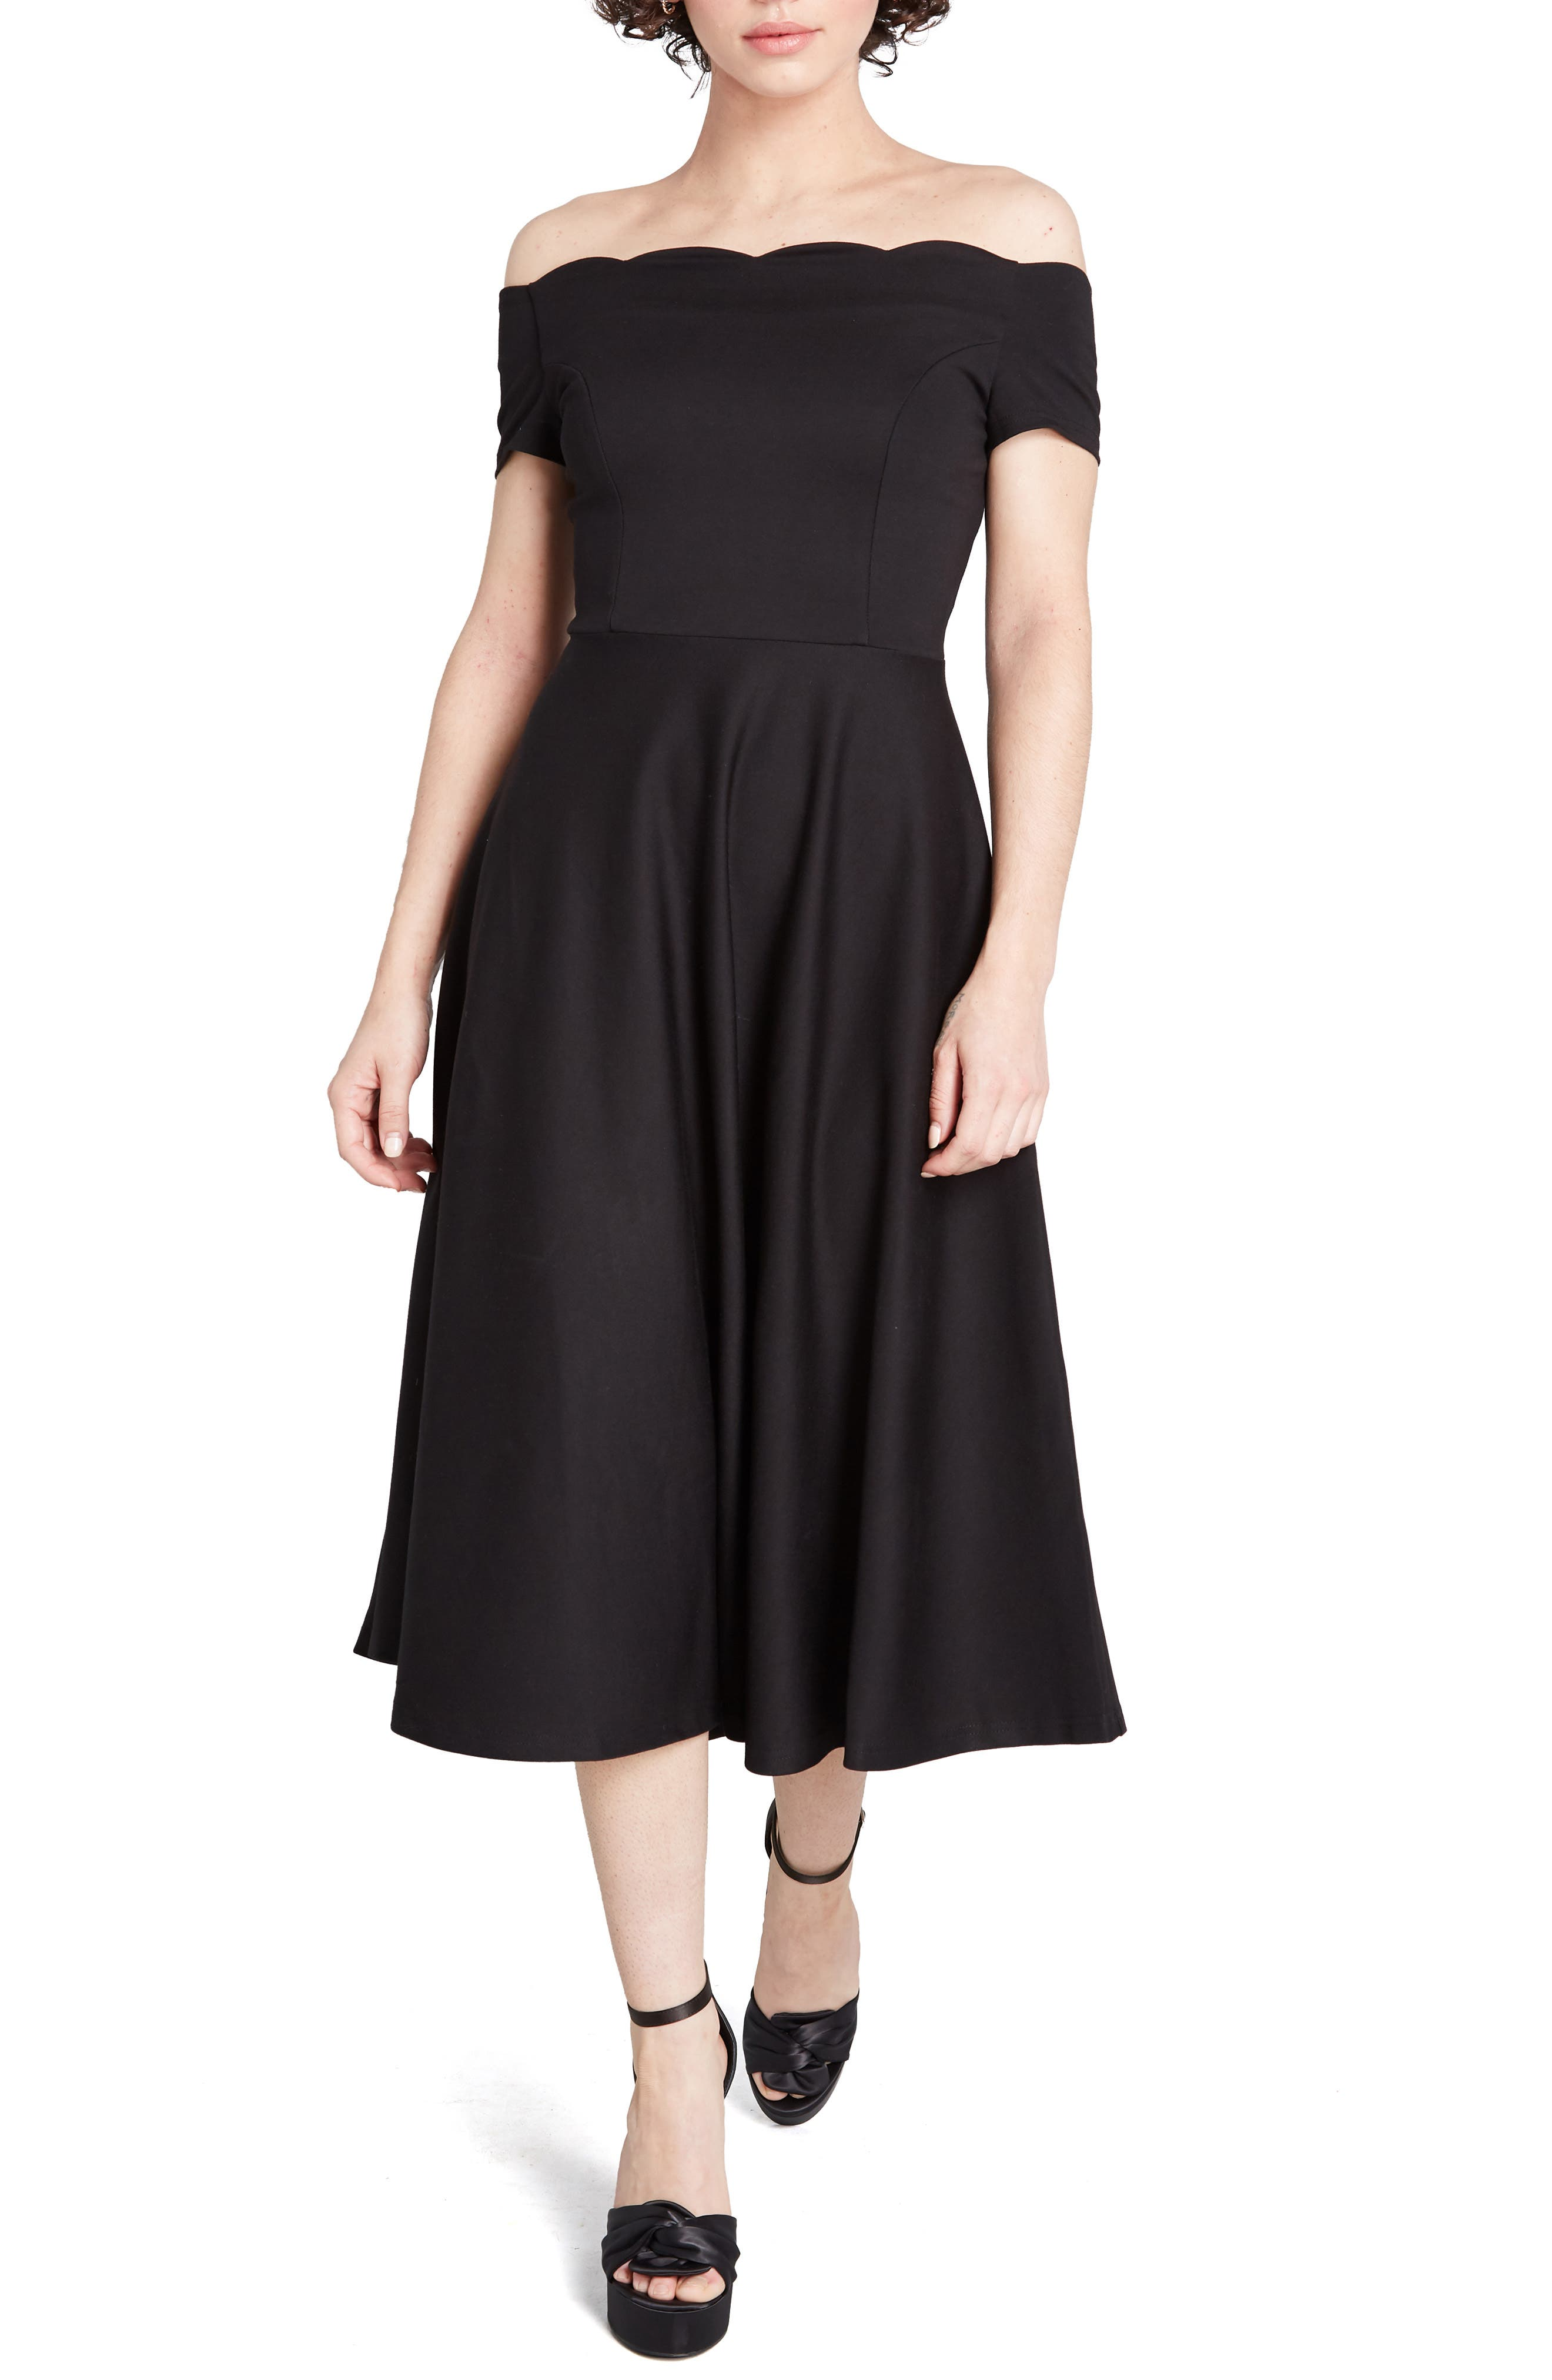 1950s Party Dresses & Prom Dresses for Sale Womens Modcloth Timeless Favorite Off The Shoulder Fit  Flare Dress $59.40 AT vintagedancer.com